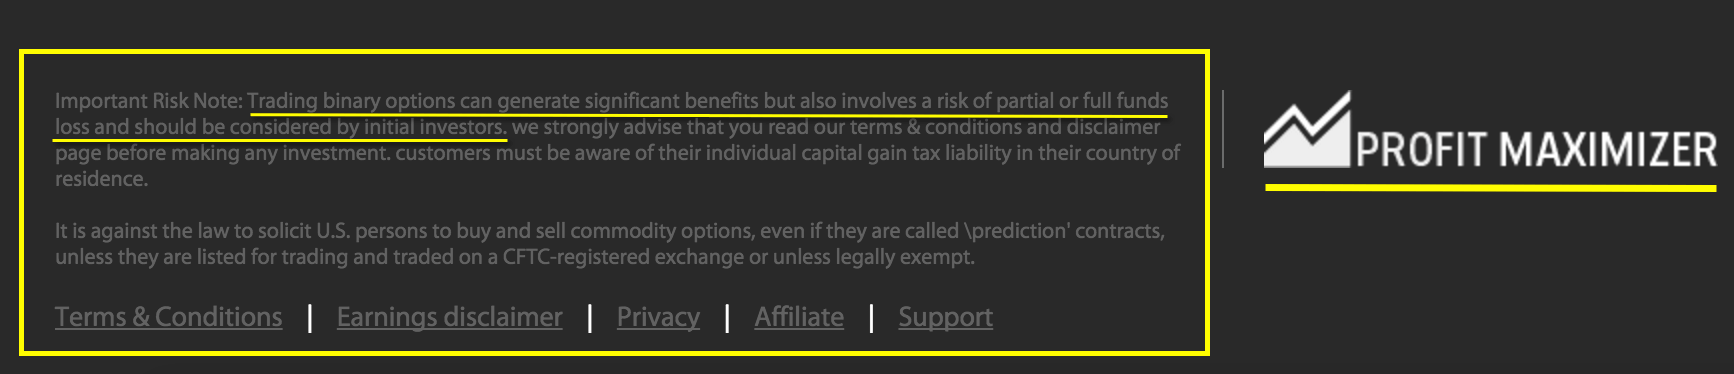 profitmaximizer-earnings-disclaimer